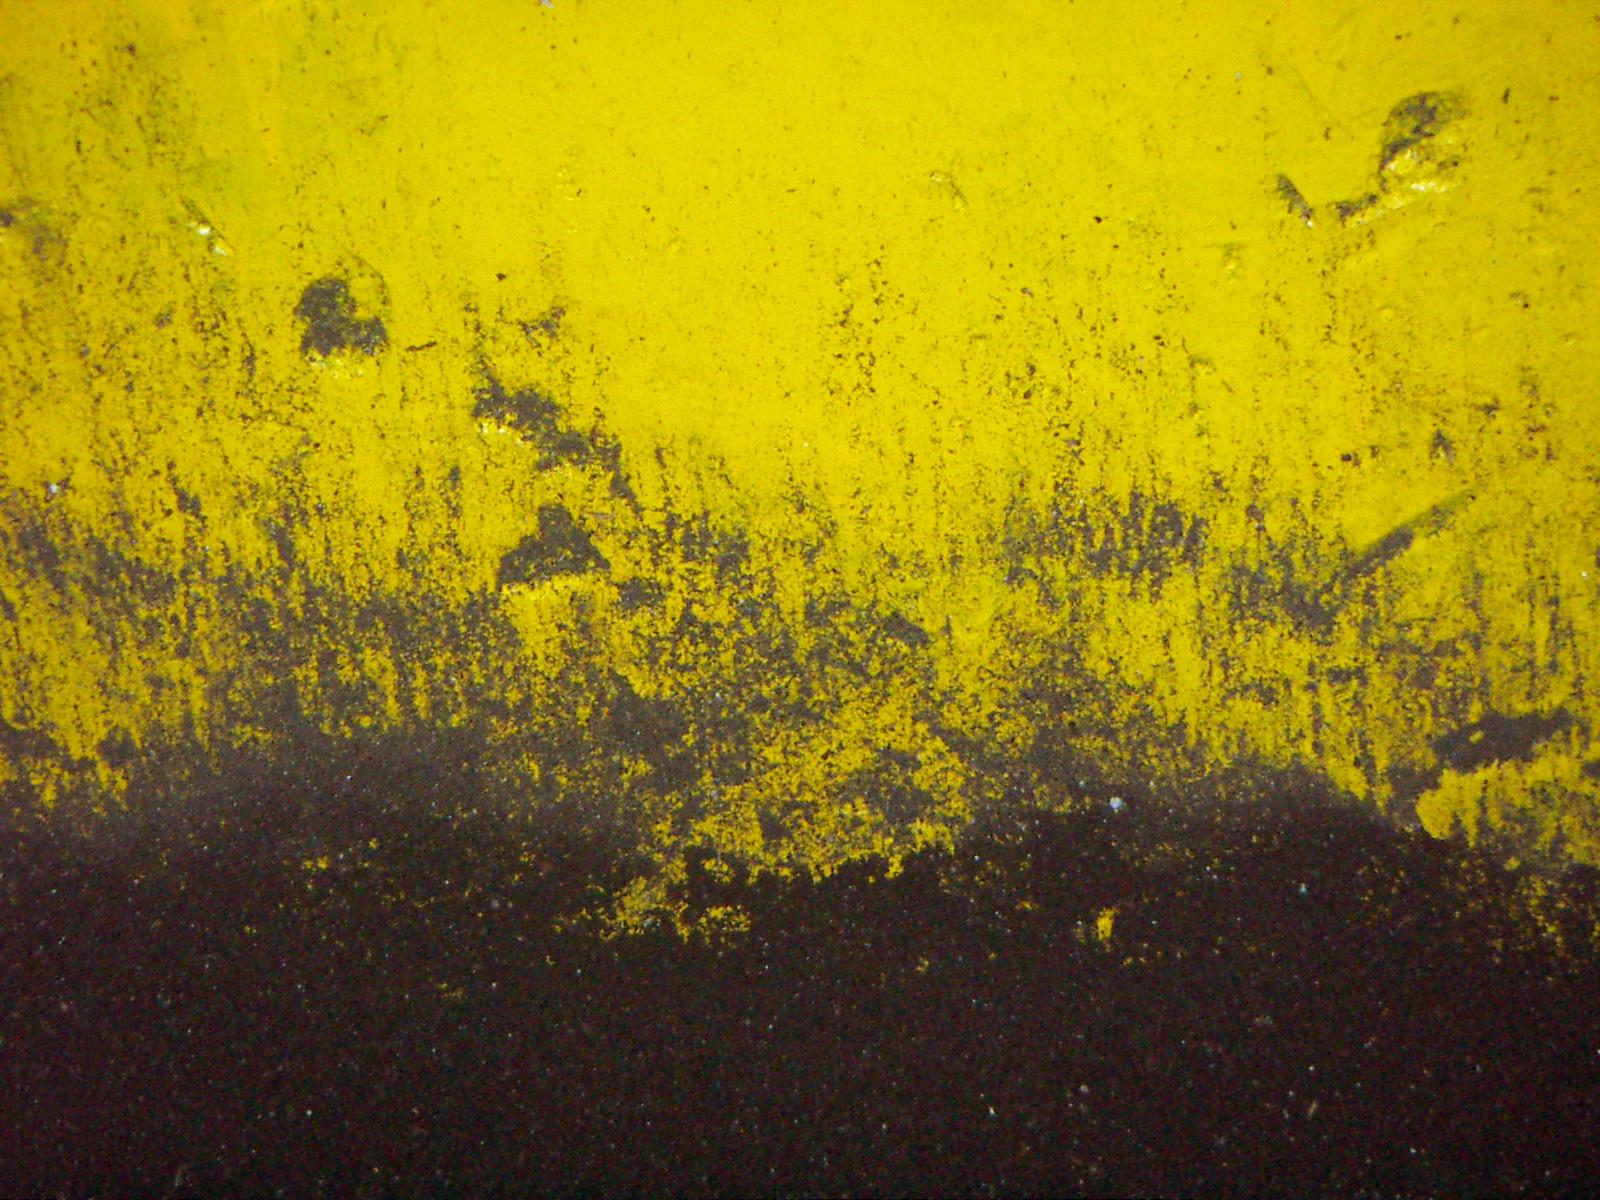 29 Black And Yellow Wallpapers On Wallpapersafari